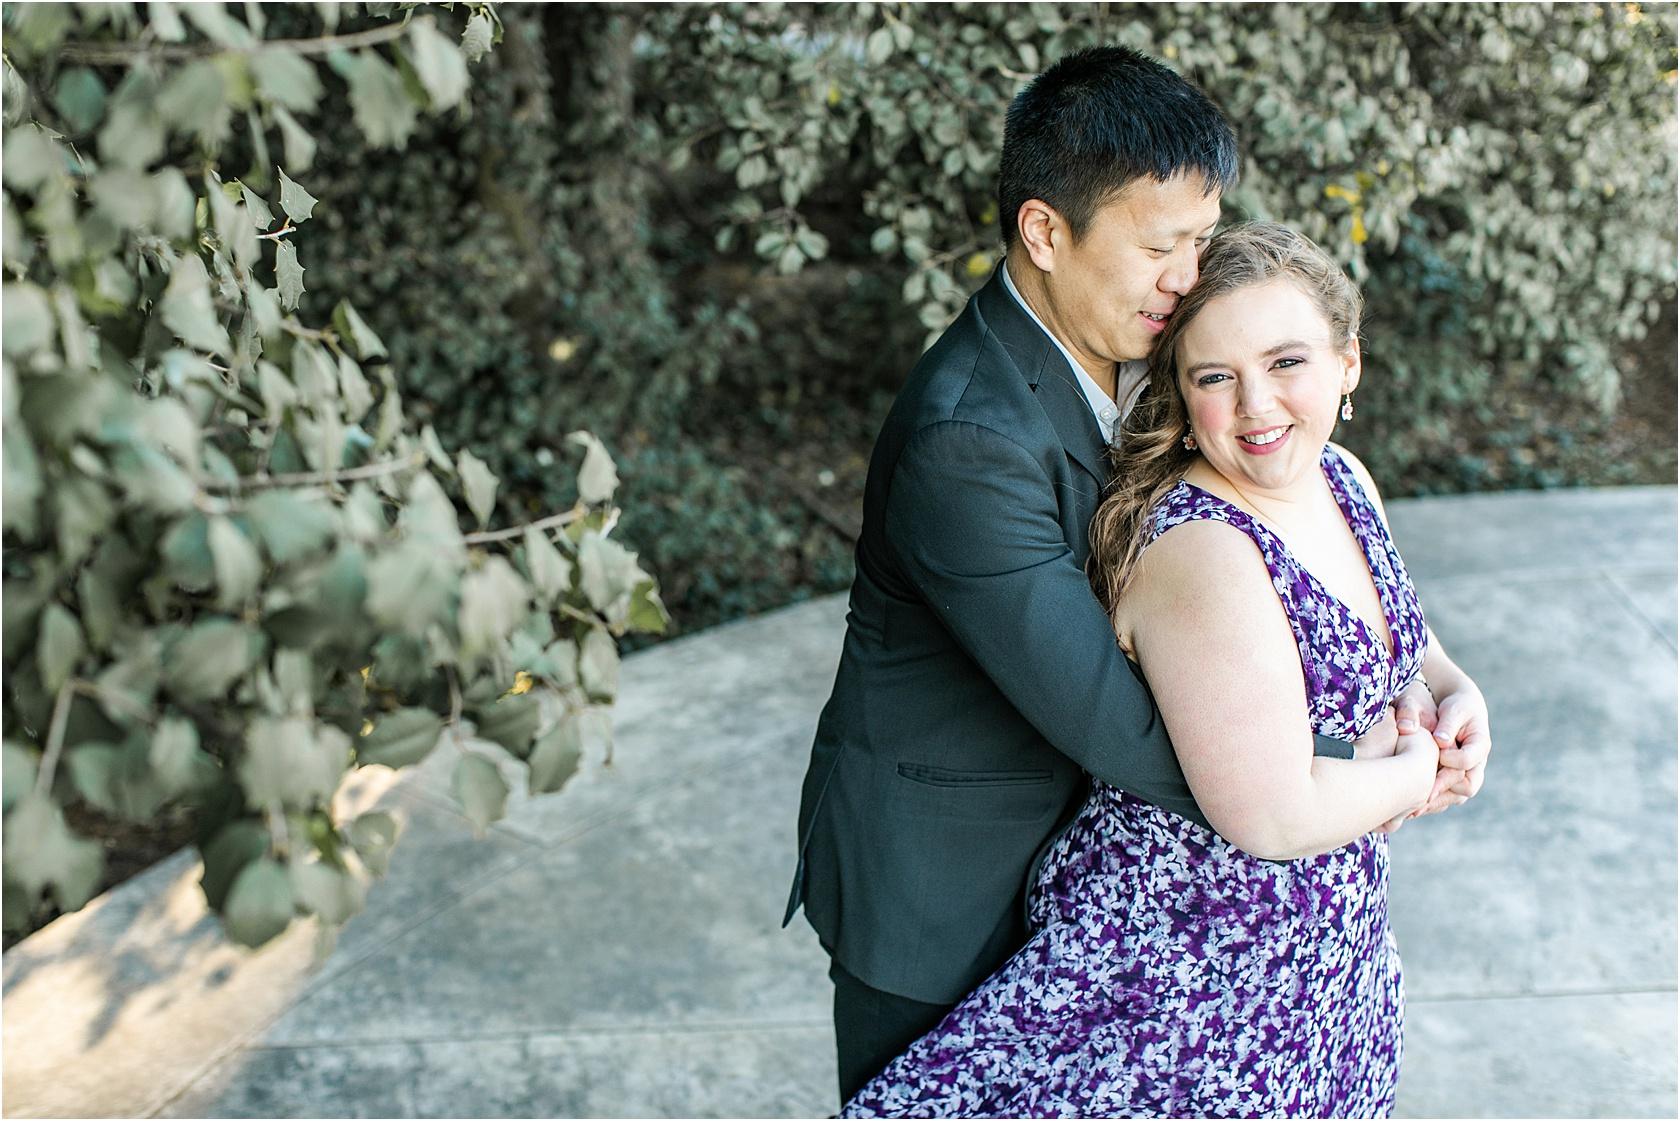 MelissaKevinCherryBlossomsDCEngagementSessionMarch2019LivingRadiantPhotographyphotos_0021.jpg